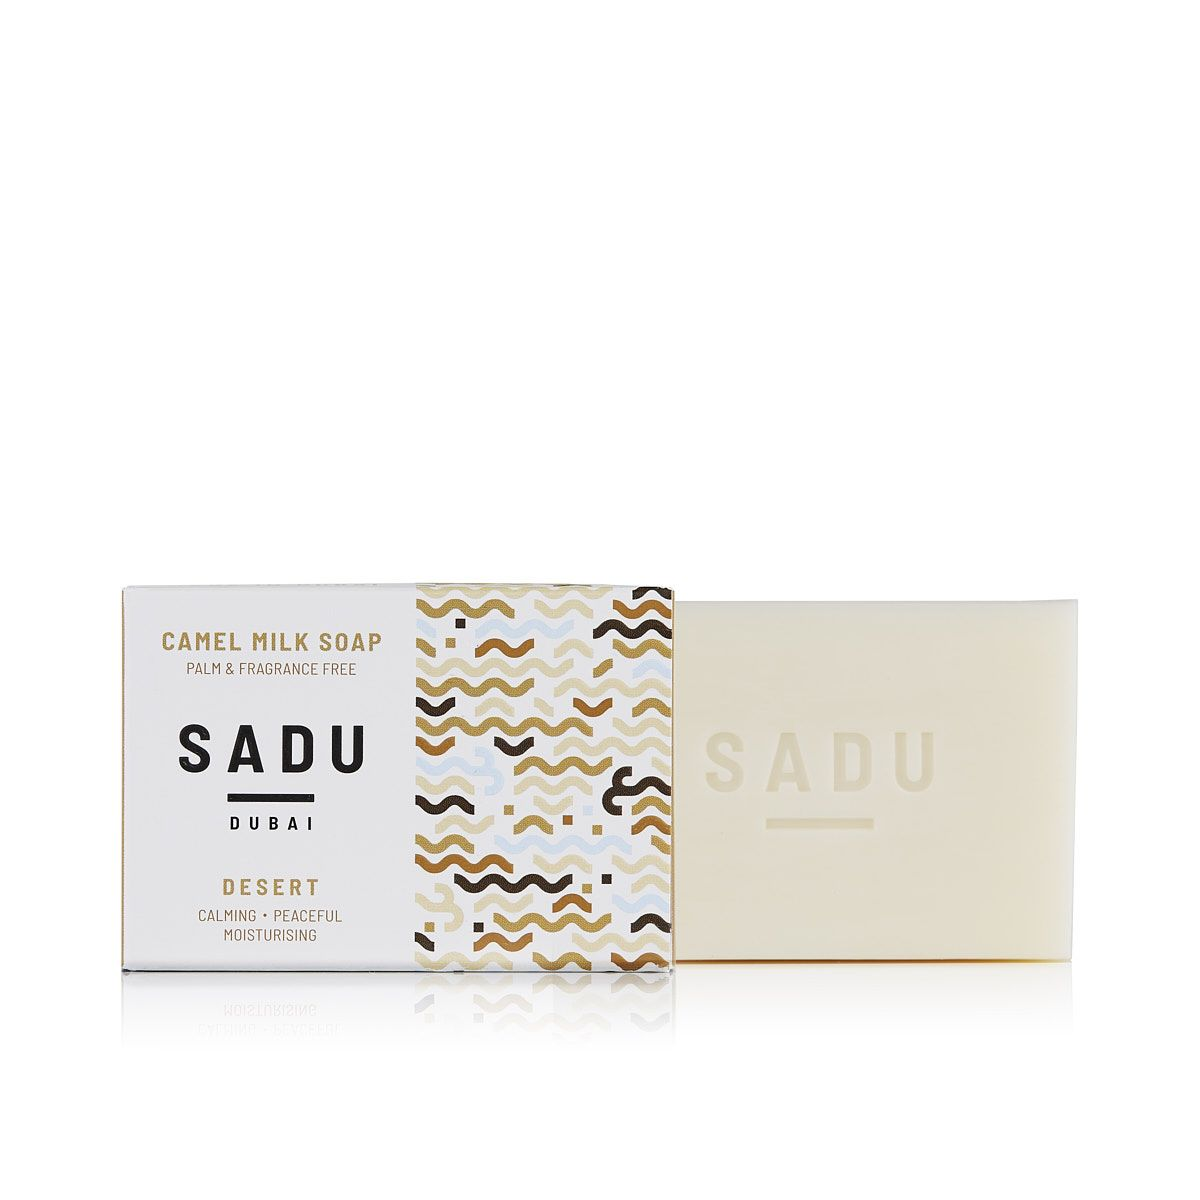 Camel milk soap Unscented - SADU collection